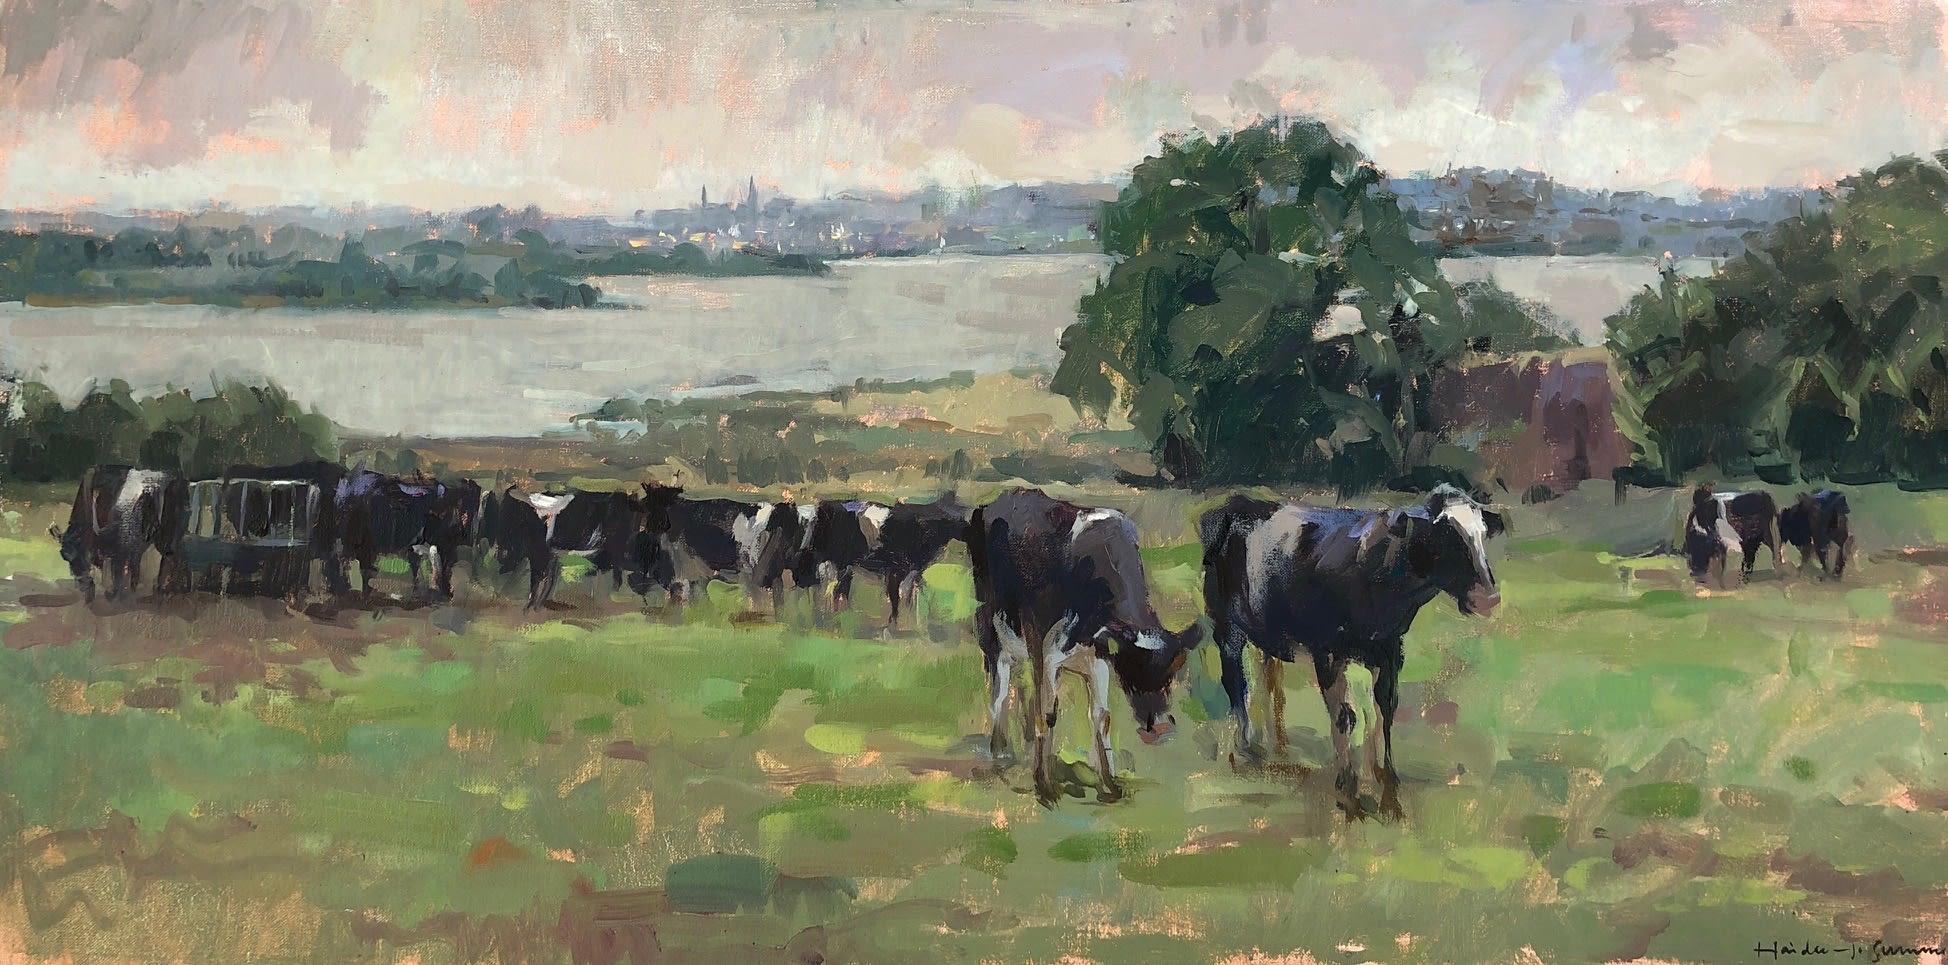 Haidee-Jo Summers: Dairy Herd at Artramon Farm